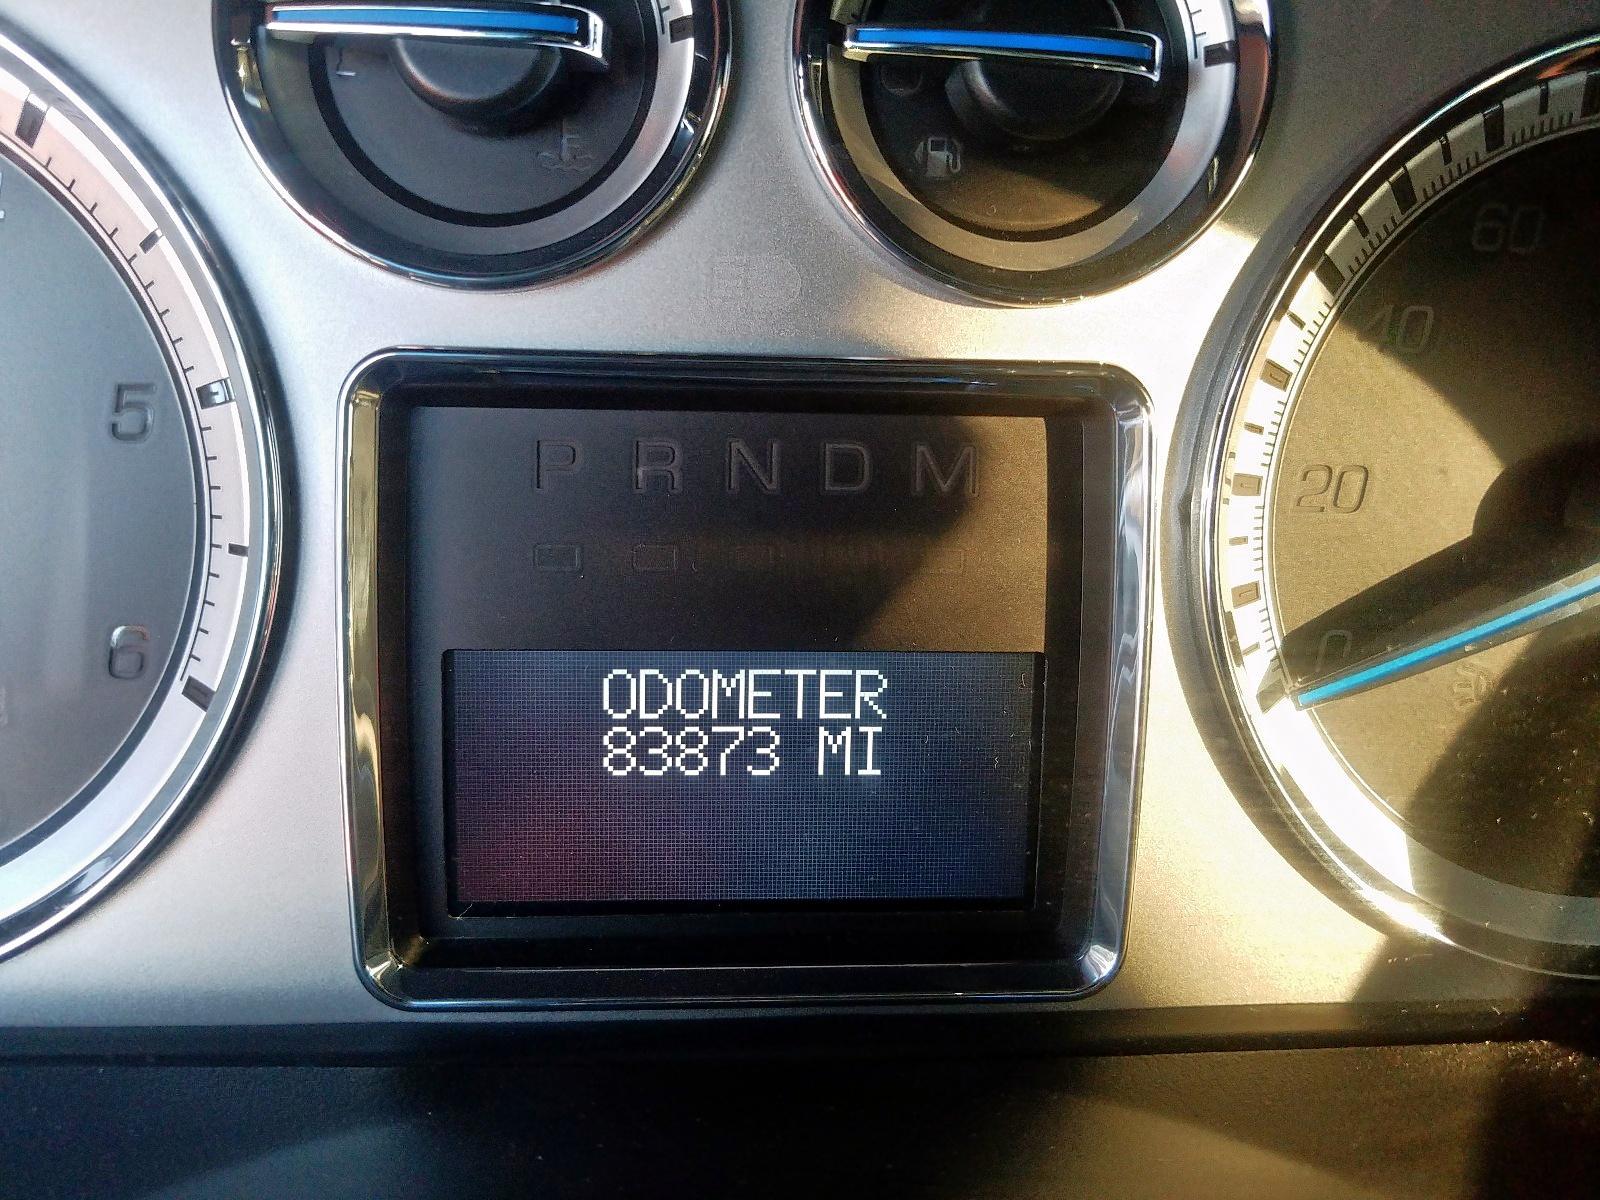 1GYS4AEF0BR132555 - 2011 Cadillac Escalade 6.2L front view